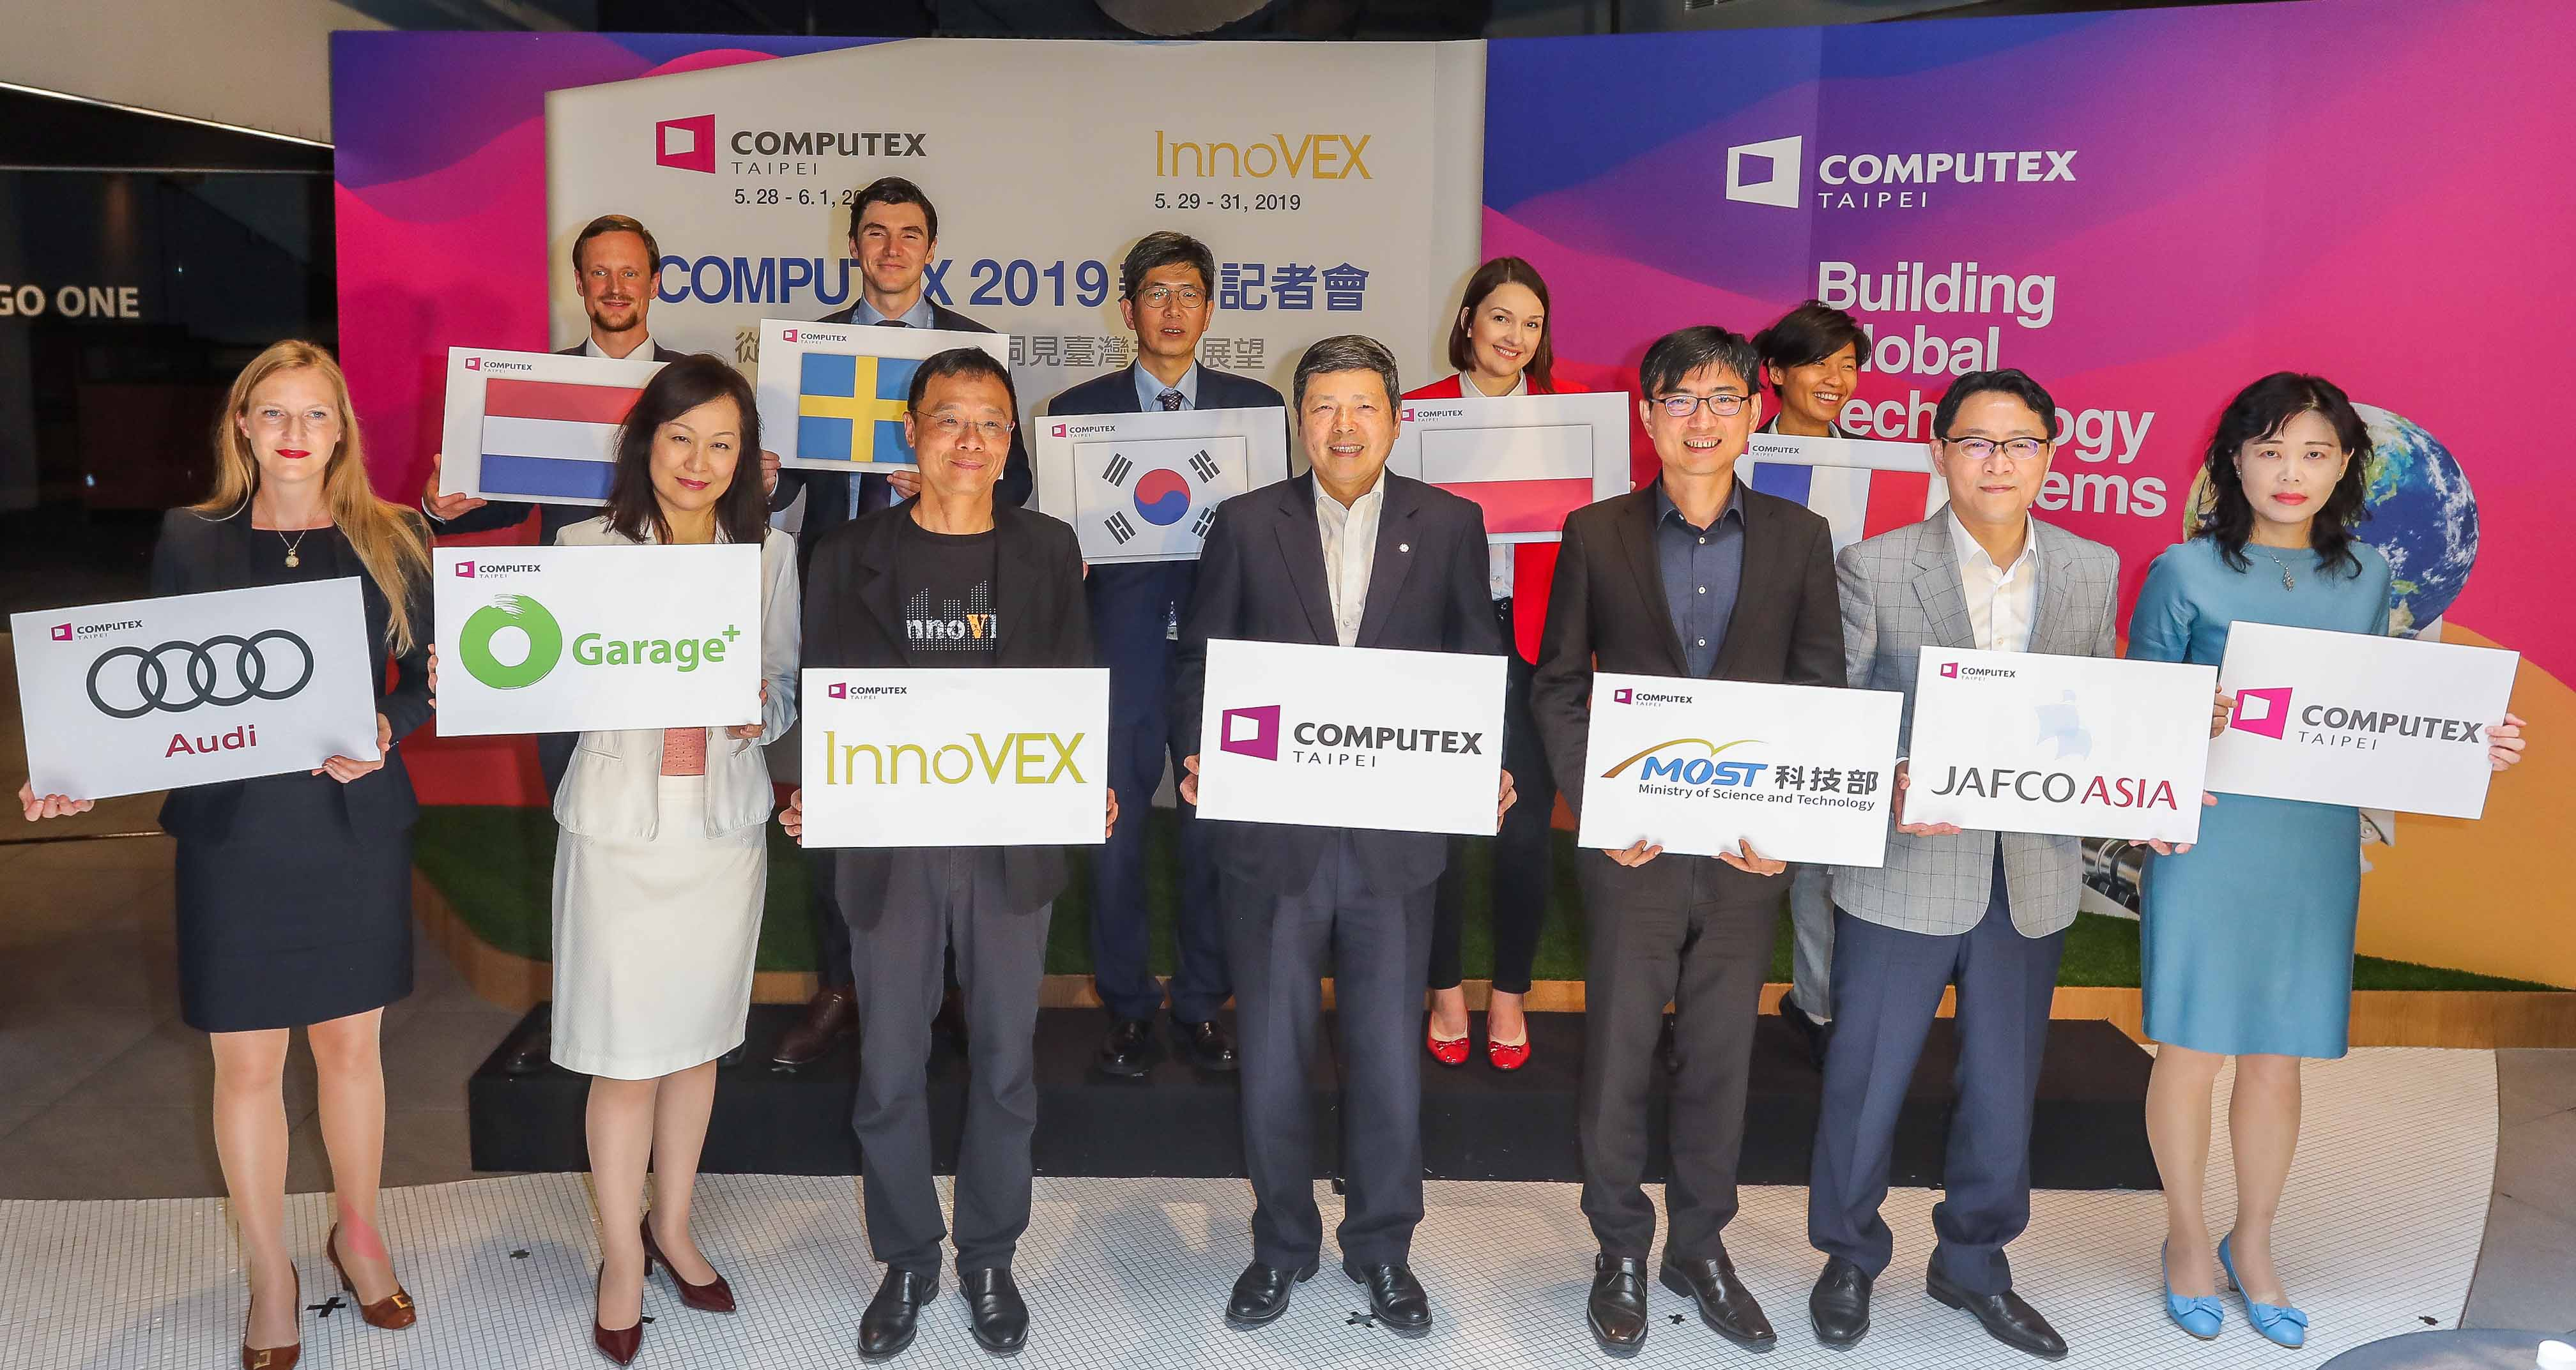 Computex 2019:COMPUTEX 2019從全球新創趨勢  洞見臺灣未來展望 InnoVEX展區匯集完整生態系 展現豐沛創新能量